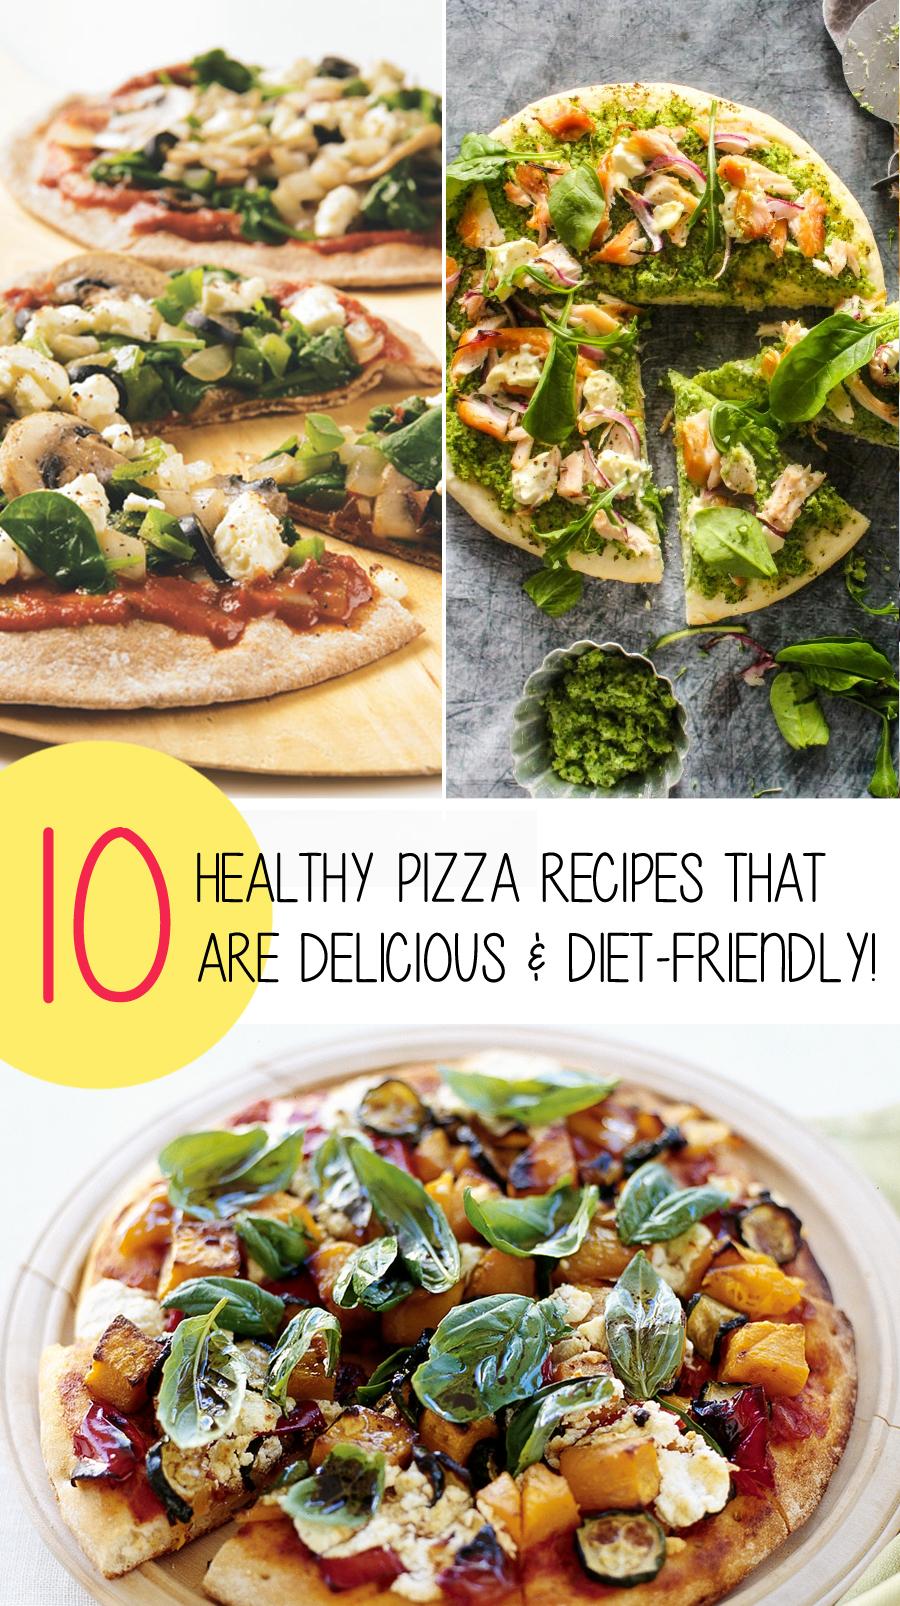 10-Healthy-Pizza-Recipes